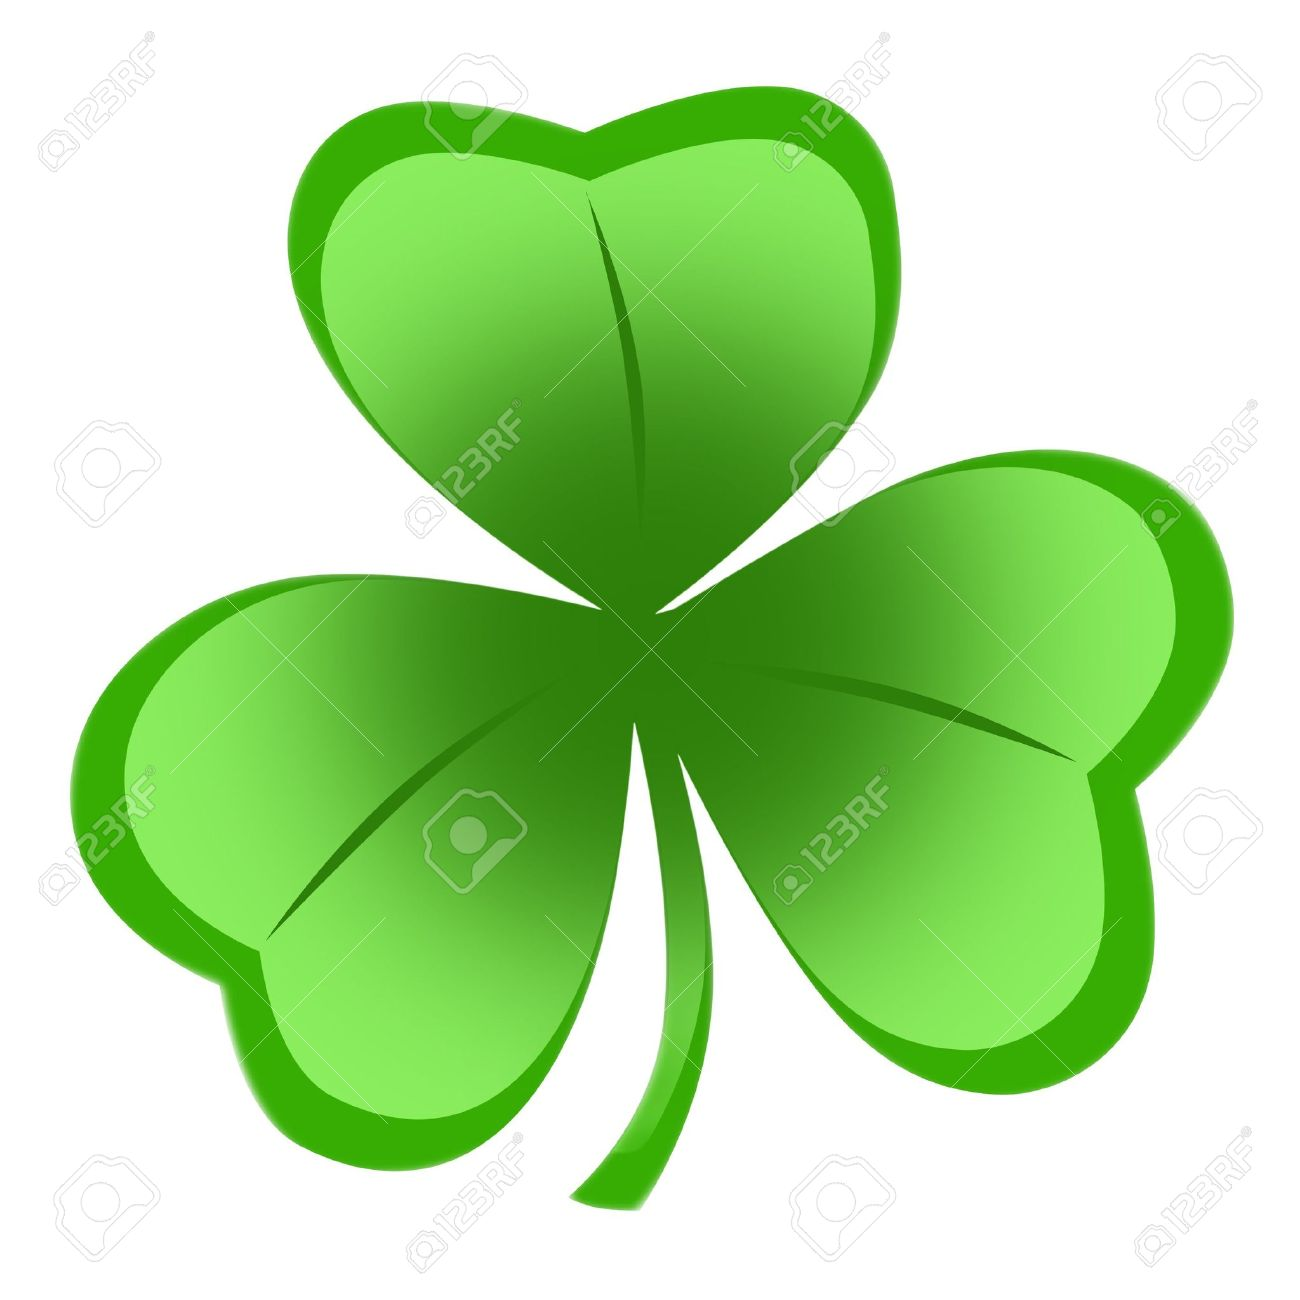 Irish shamrock ideal for St Patrick's Day isolated over white background Stock Photo - 6484505